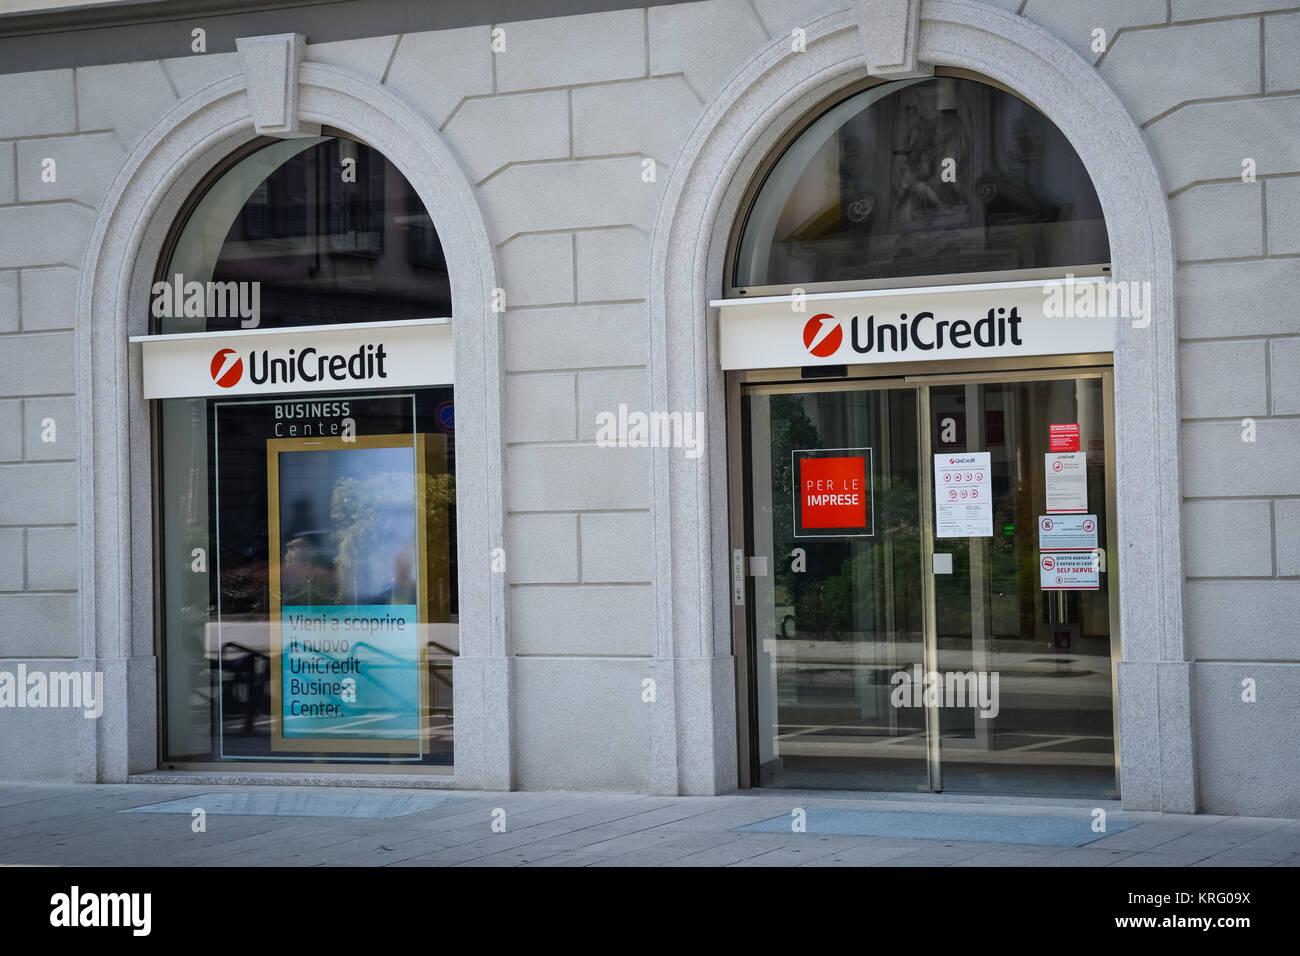 Unicredit Bank In Milan Stock Photos  Unicredit Bank In Milan Stock Images  Alamy